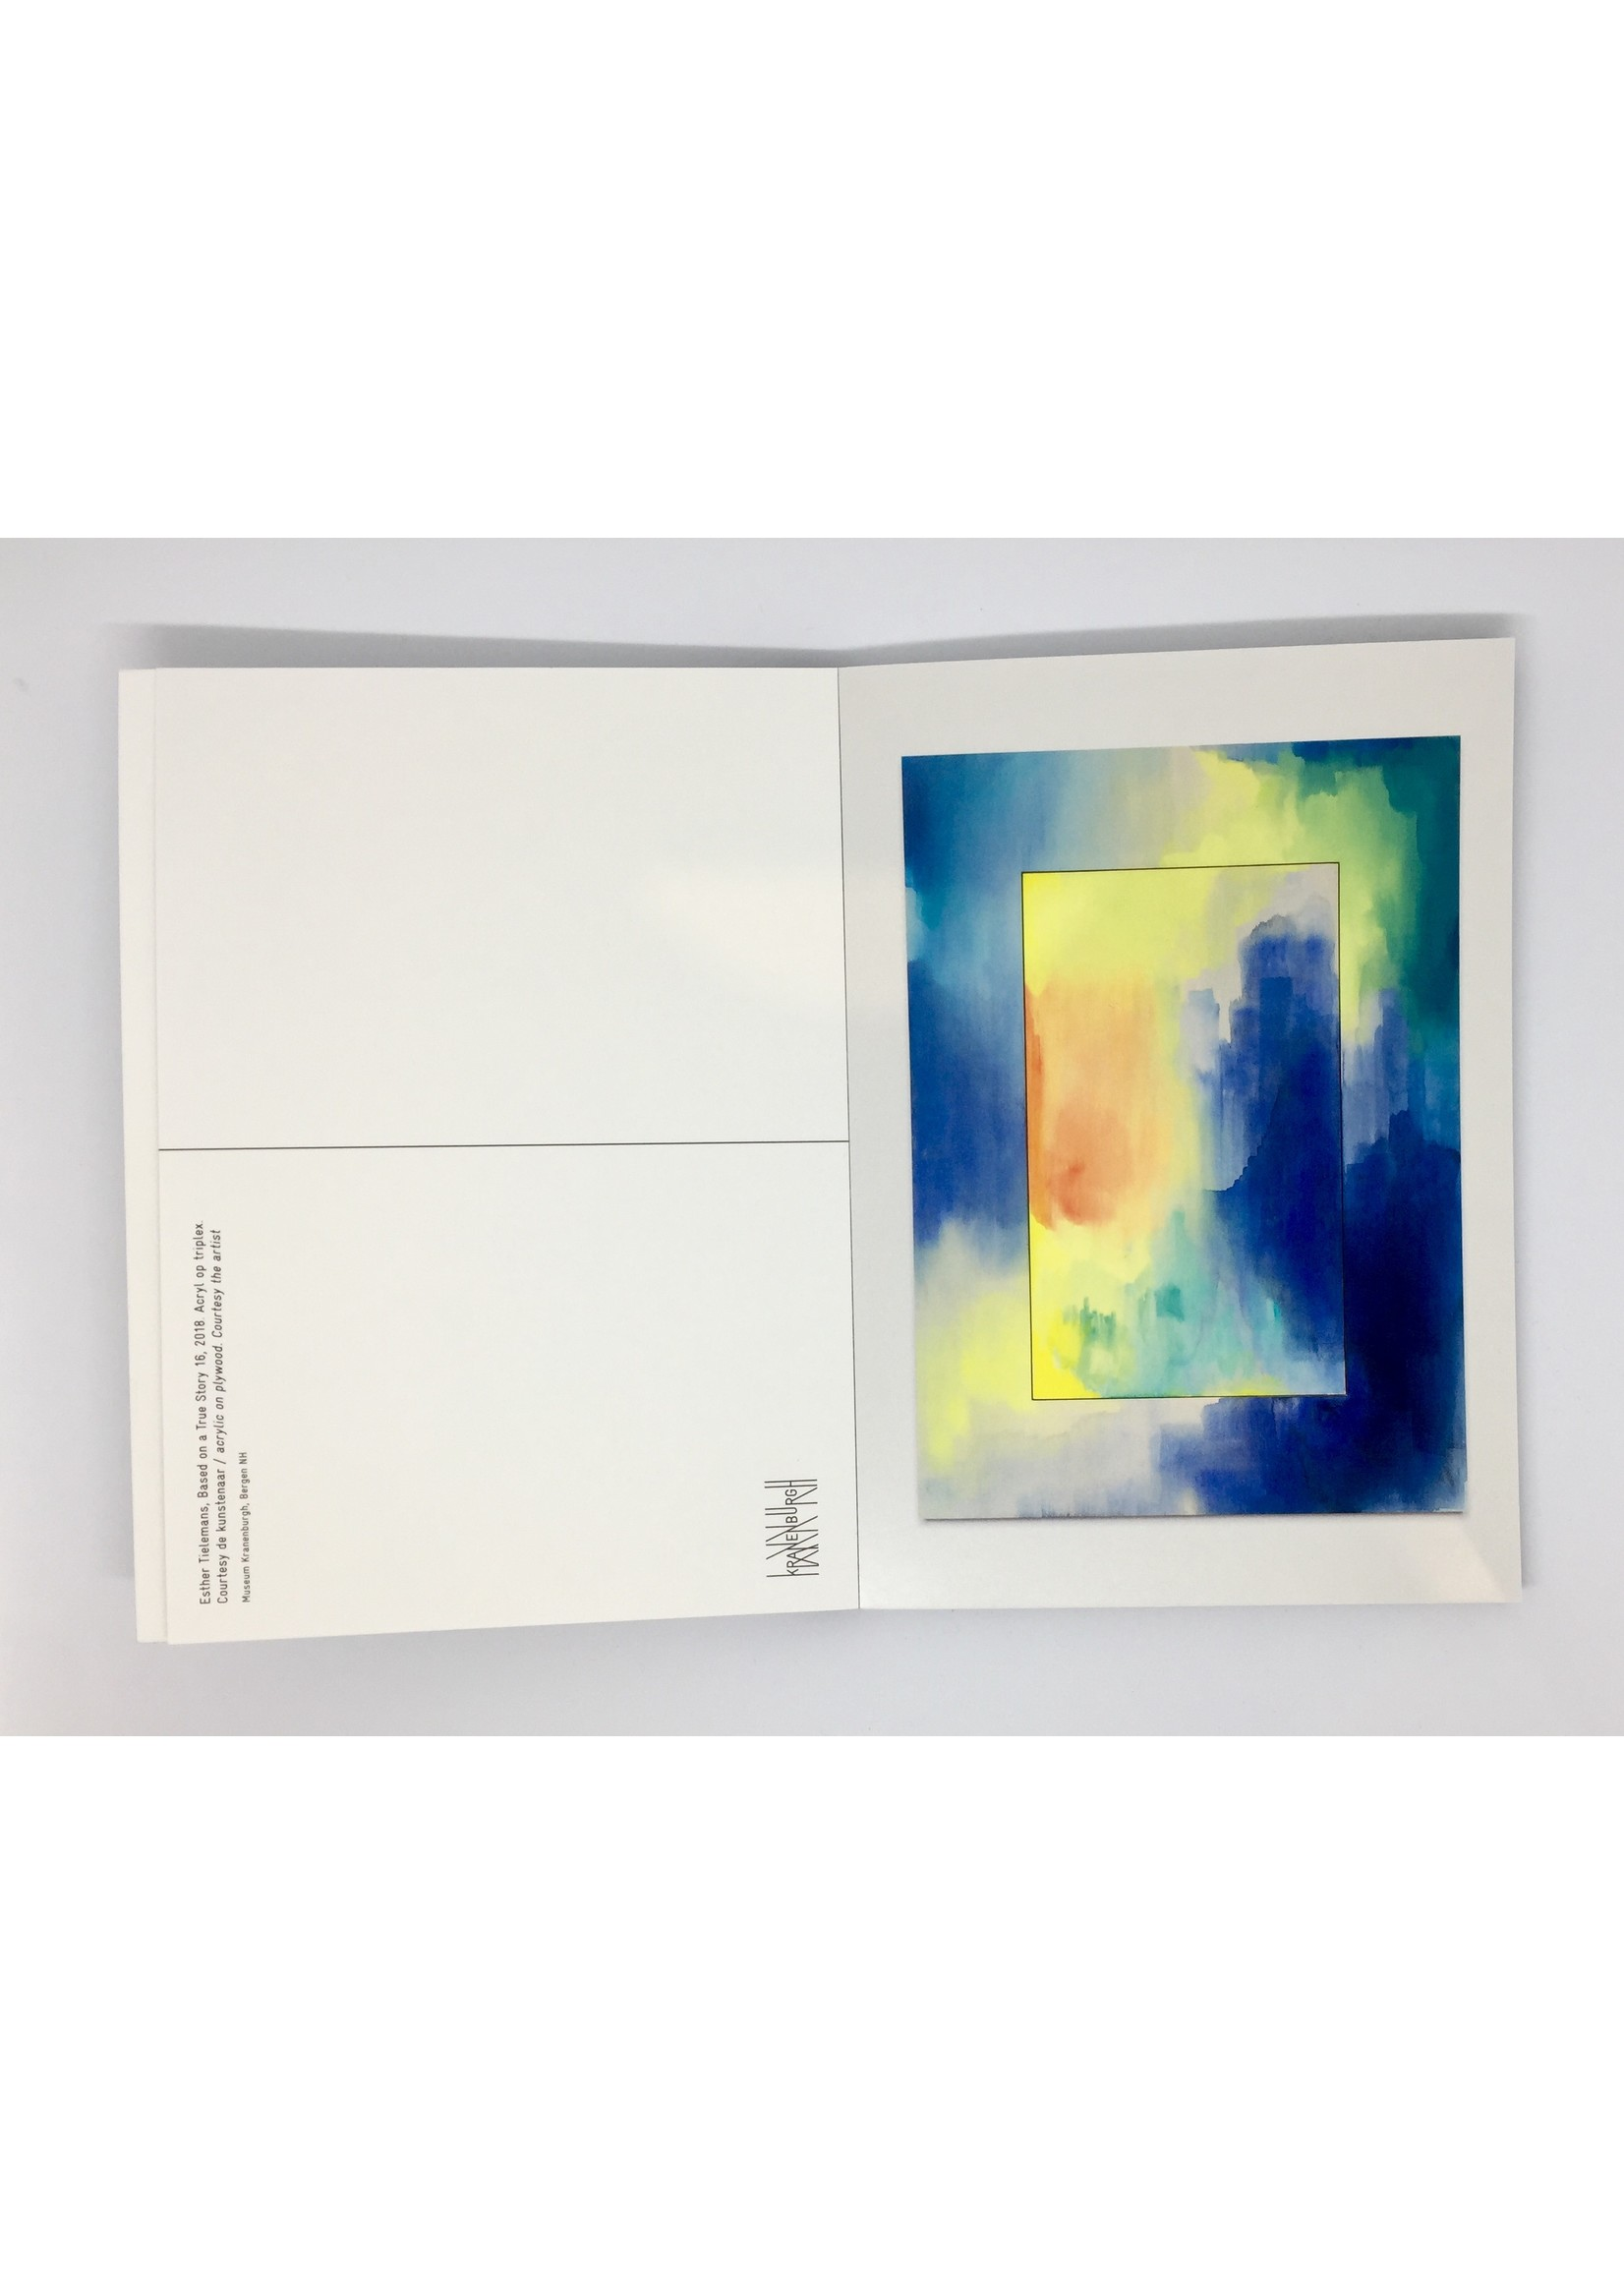 Art card book of Esther Tielemans